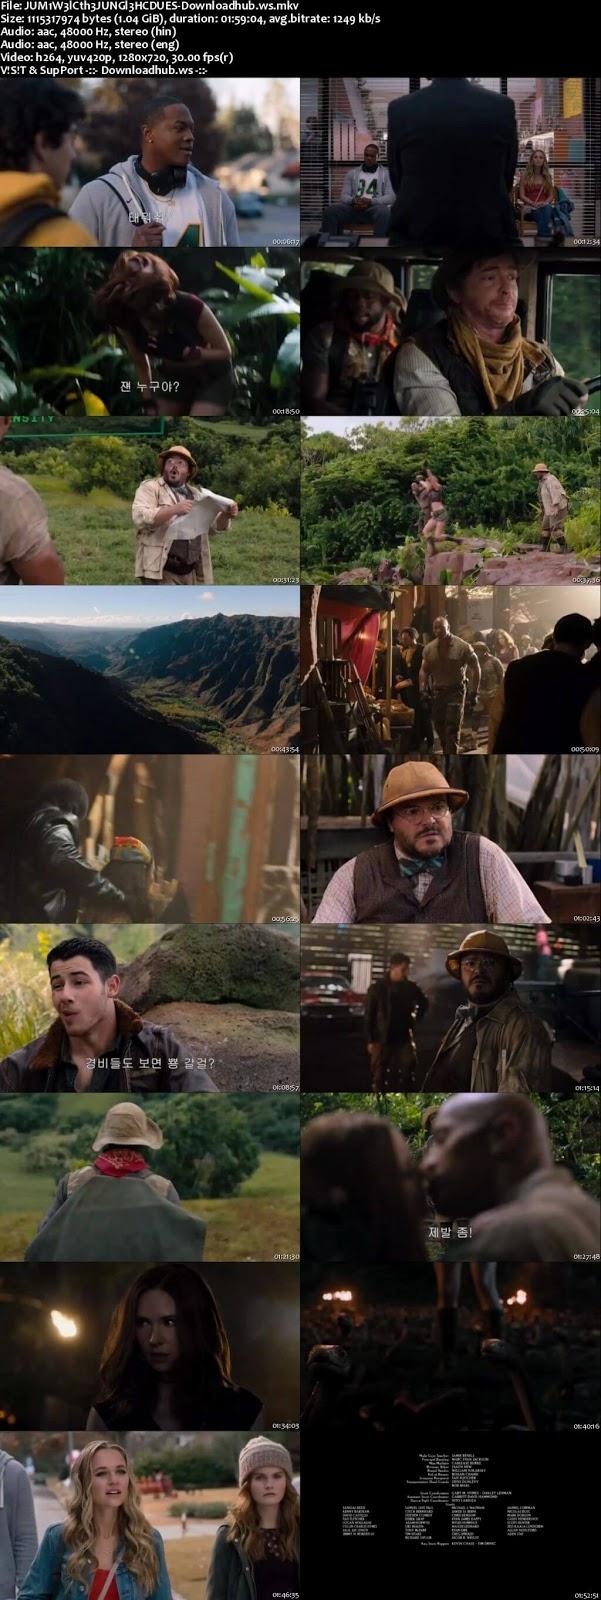 Jumanji Welcome to the Jungle 2017 Hindi Dual Audio 720p HC HDRip Download